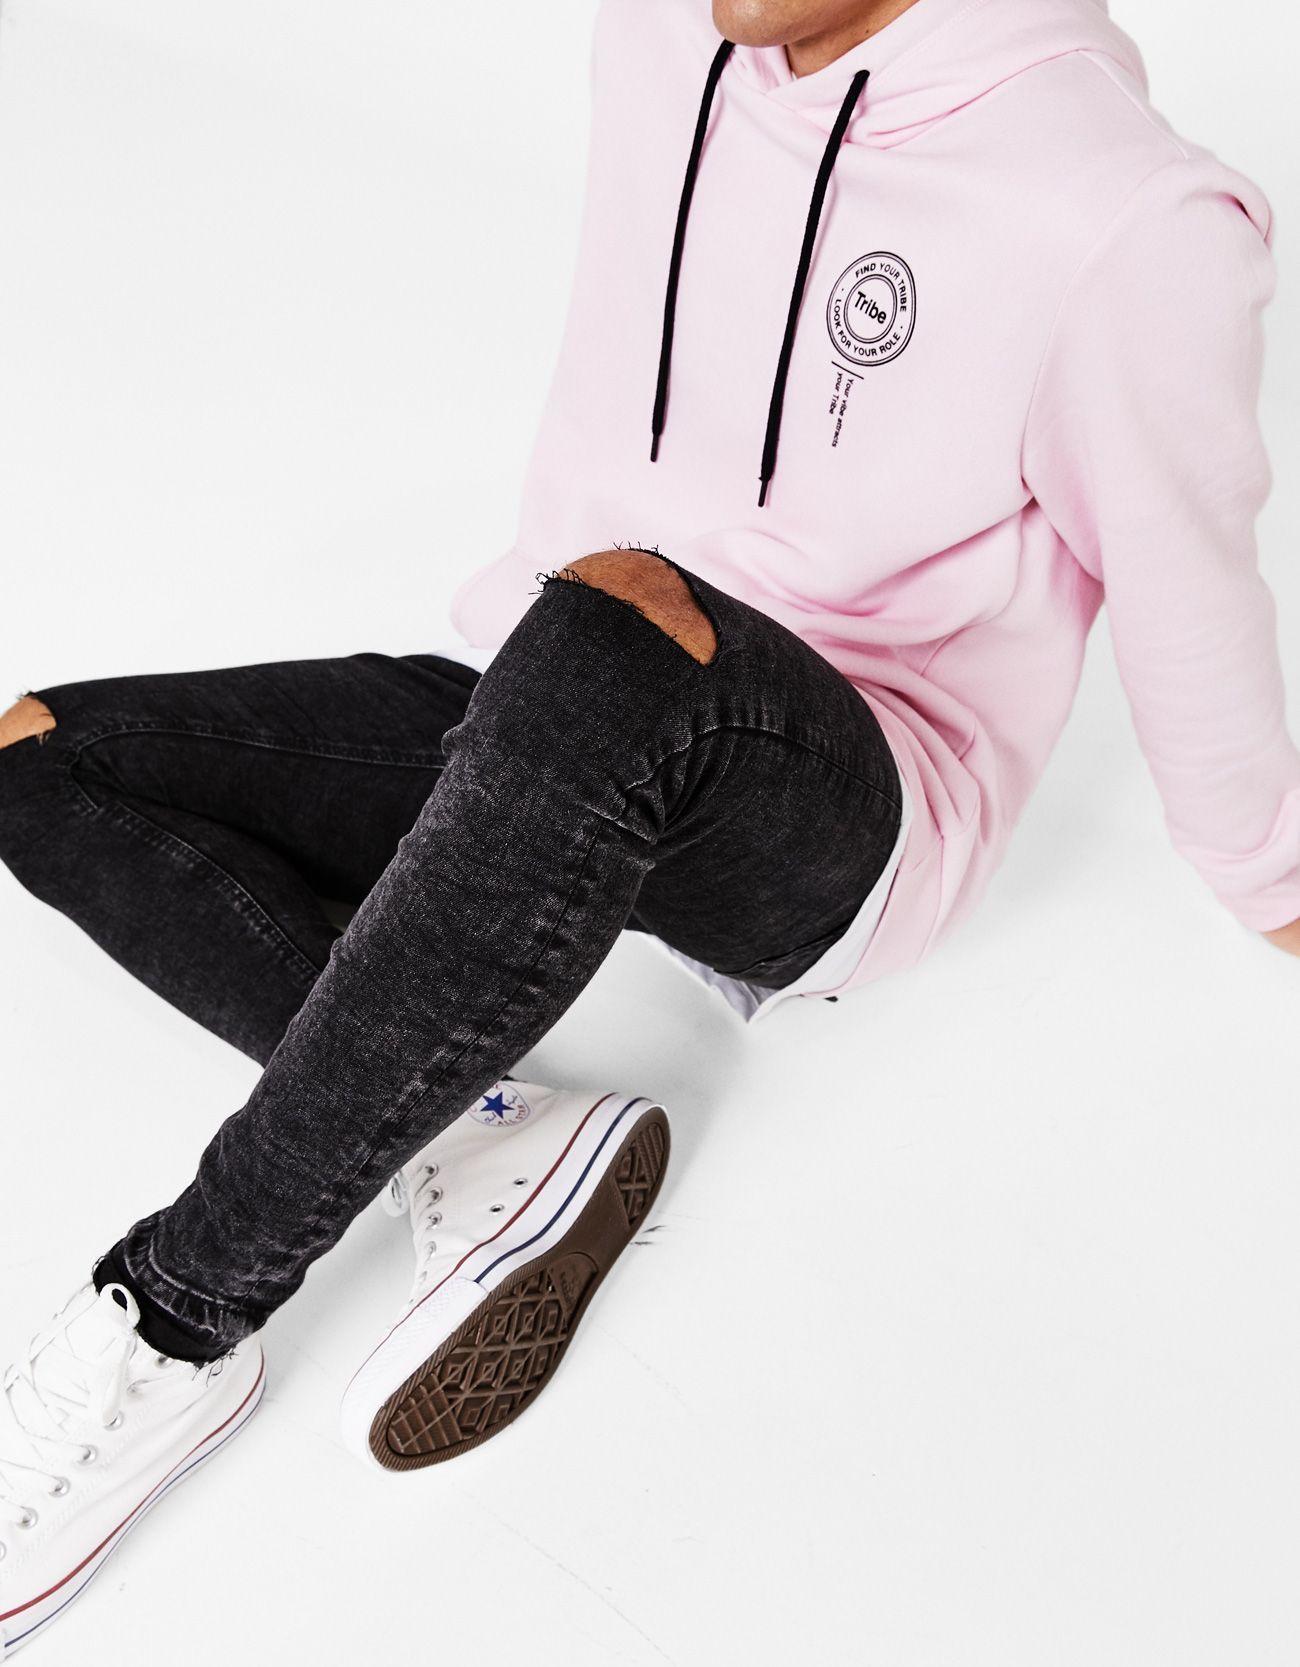 eb496e47f Jeans super skinny lavado - Jeans - Bershka España #mensjeansripped ...